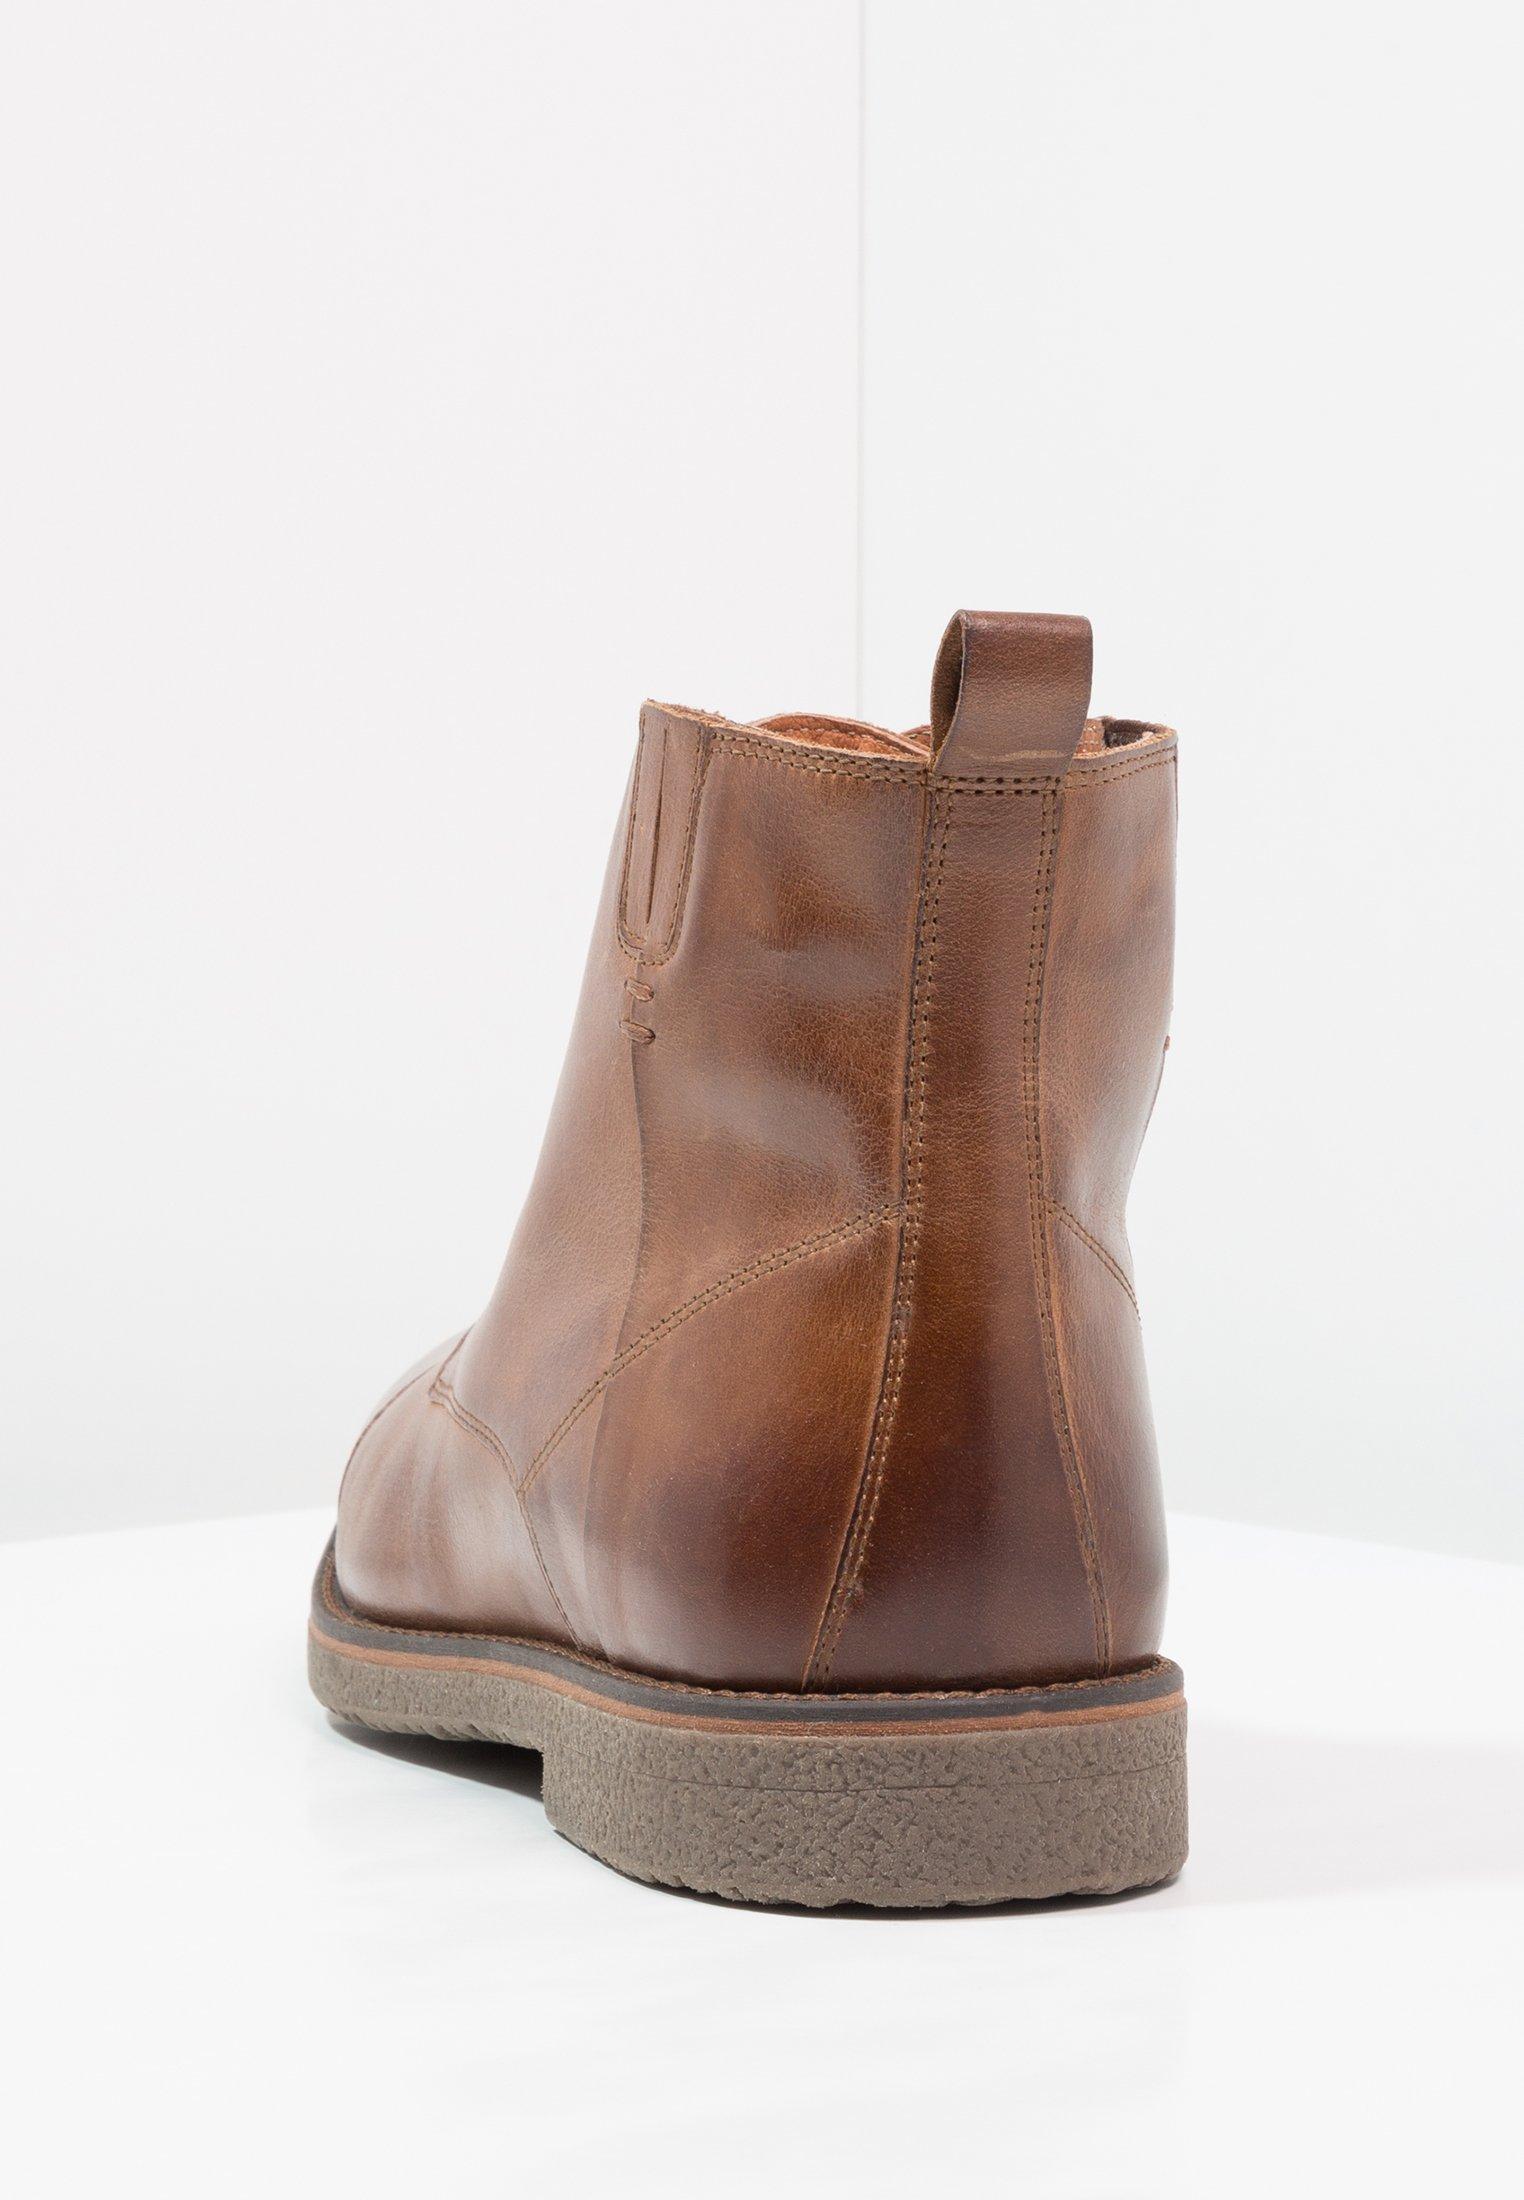 Pier One Winter Boots - Cognac